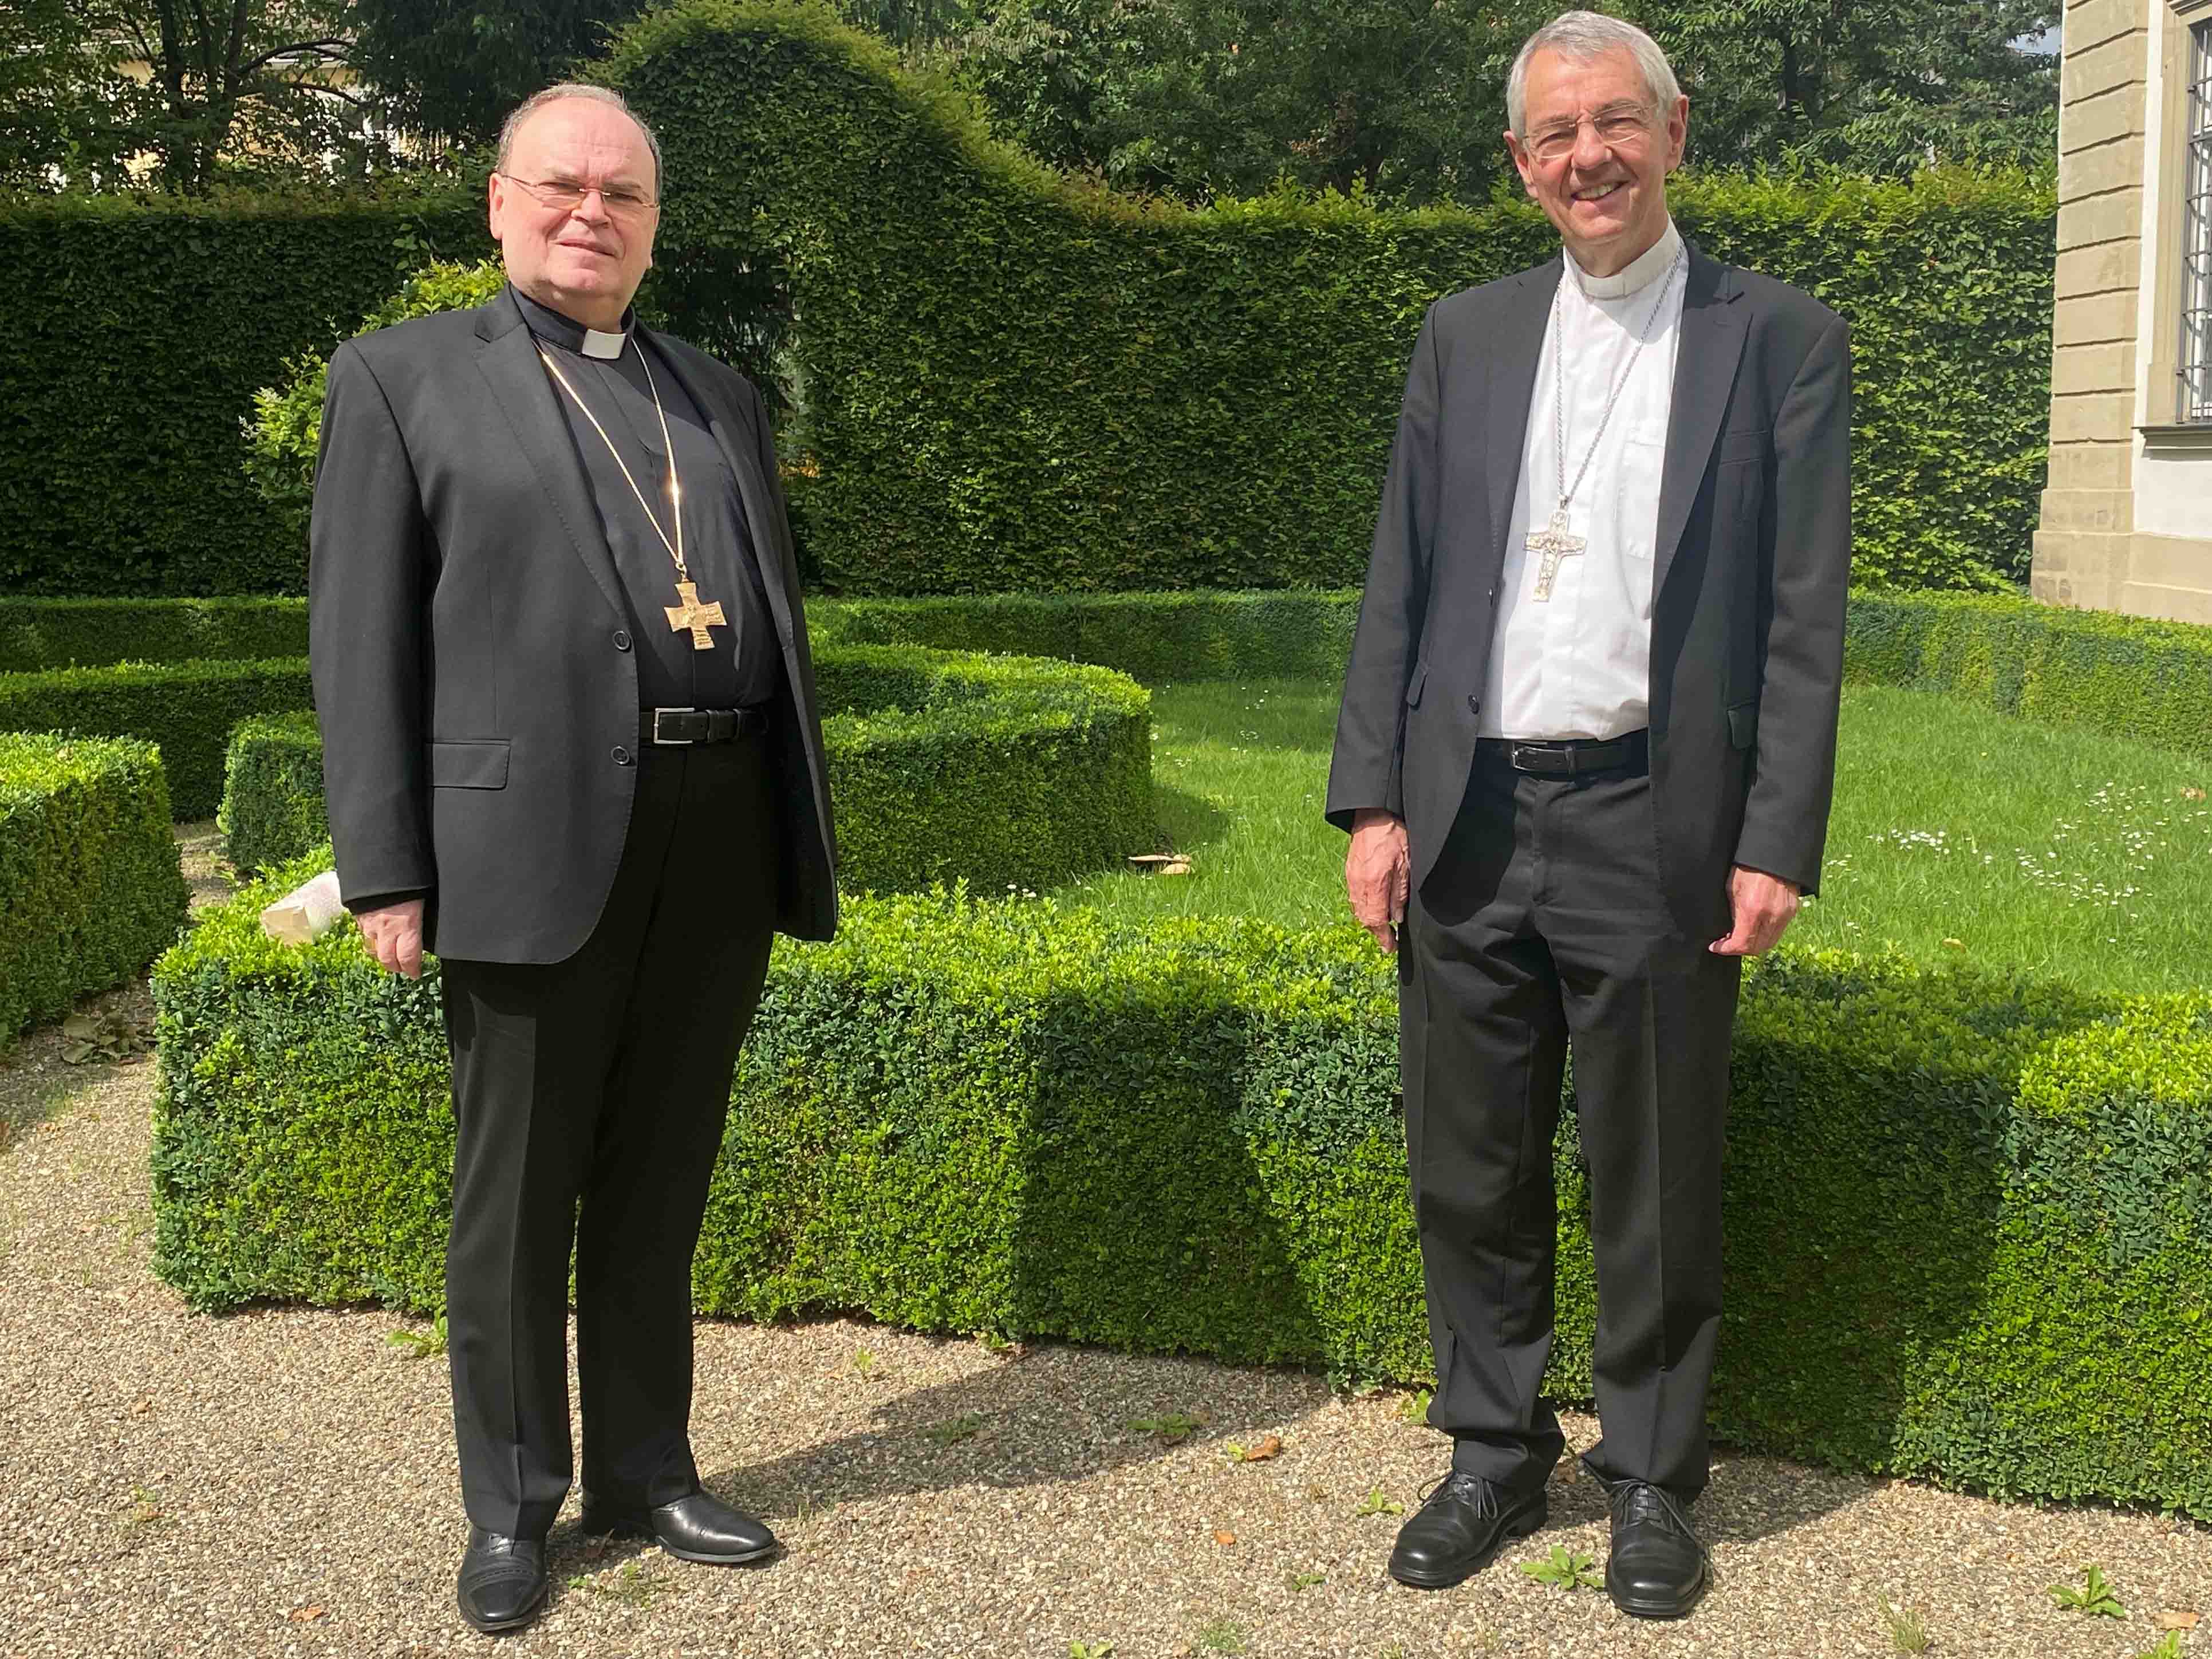 Gedankenaustausch in Bamberg: Bischof Dr. Bertram Meier trifft Erzbischof Dr. Ludwig Schick. (Foto: Pressestelle Erzbistum Bamberg / Harry Luck)